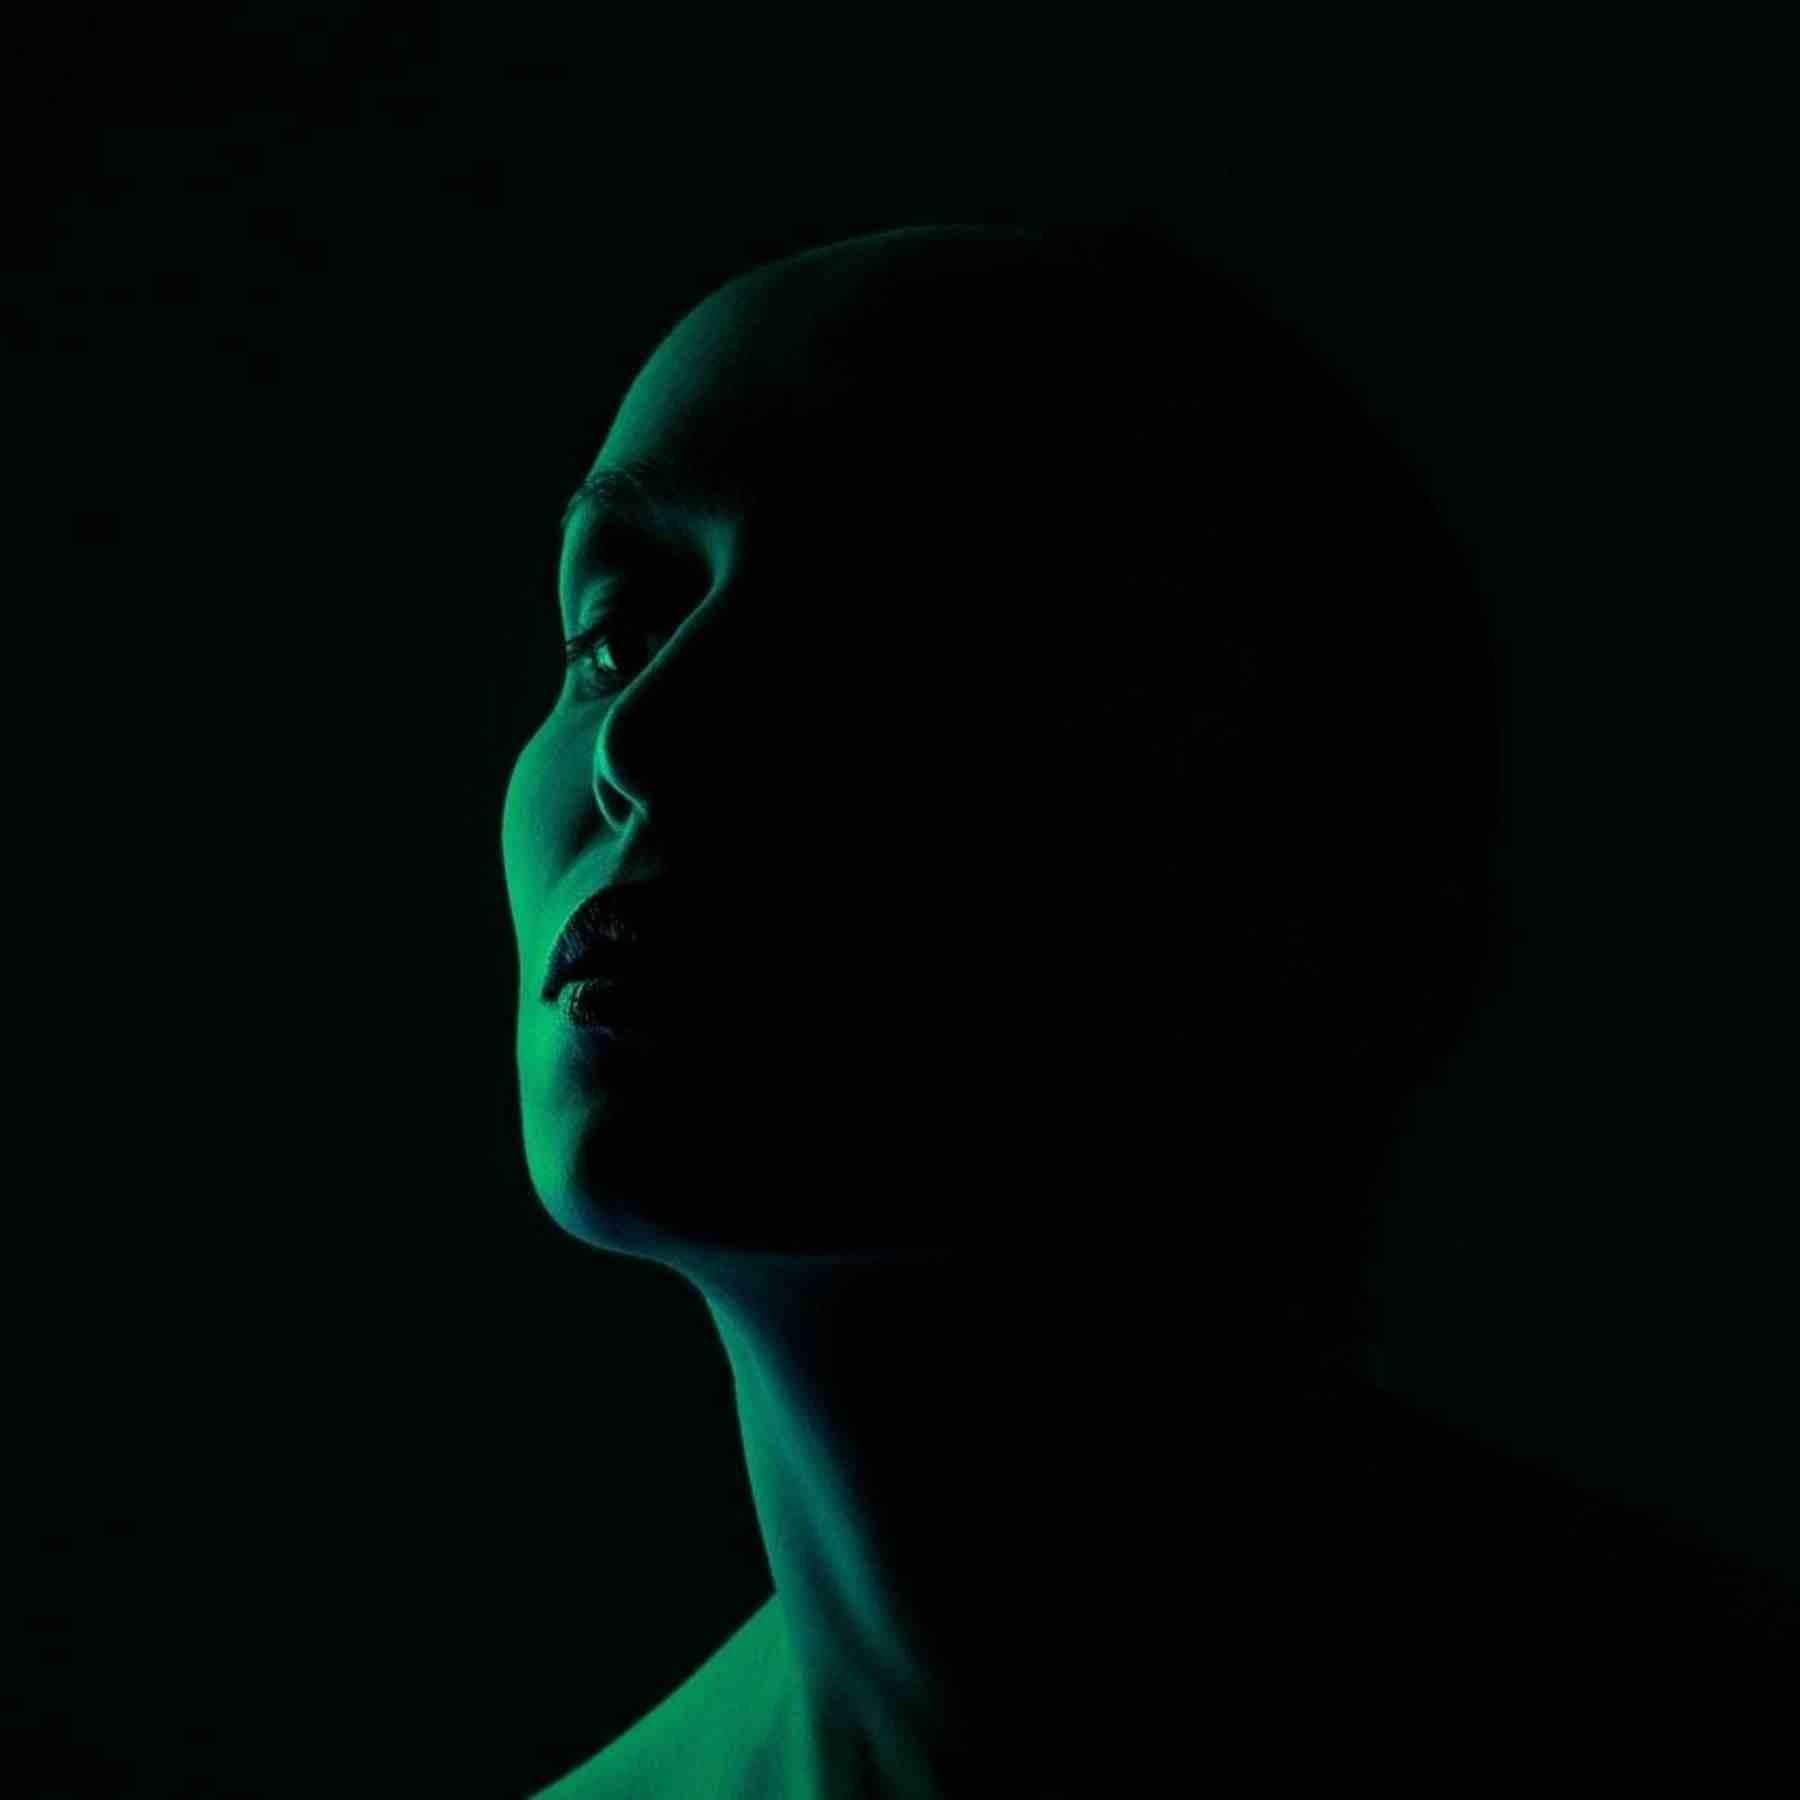 mujer oscuridad perfil poemas